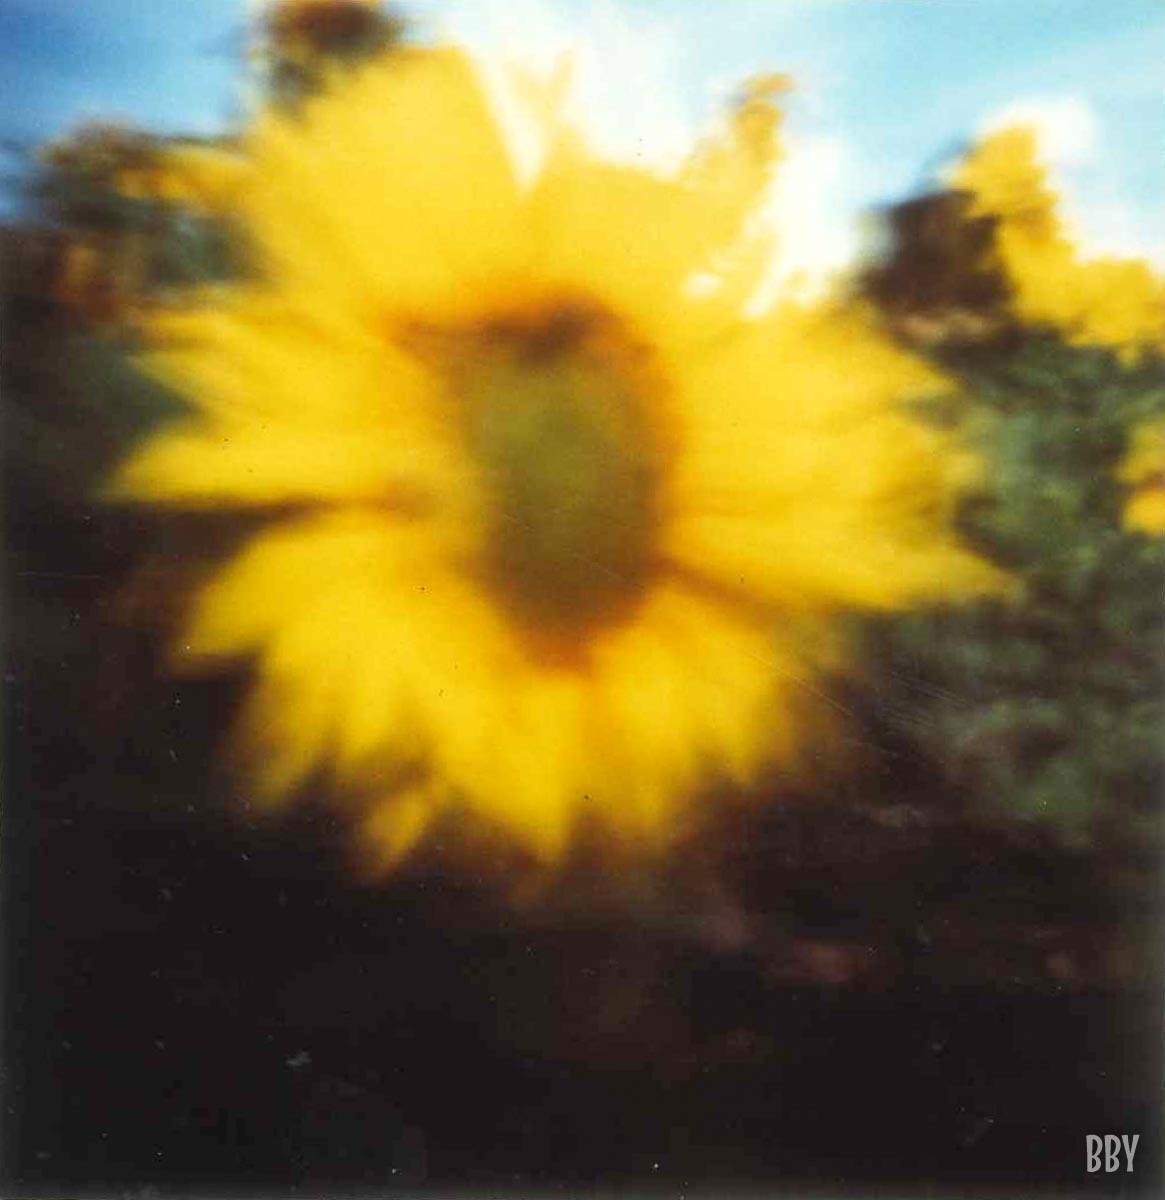 stenope, pinhole, slow photography, chambre noire, tounesol, sunflower